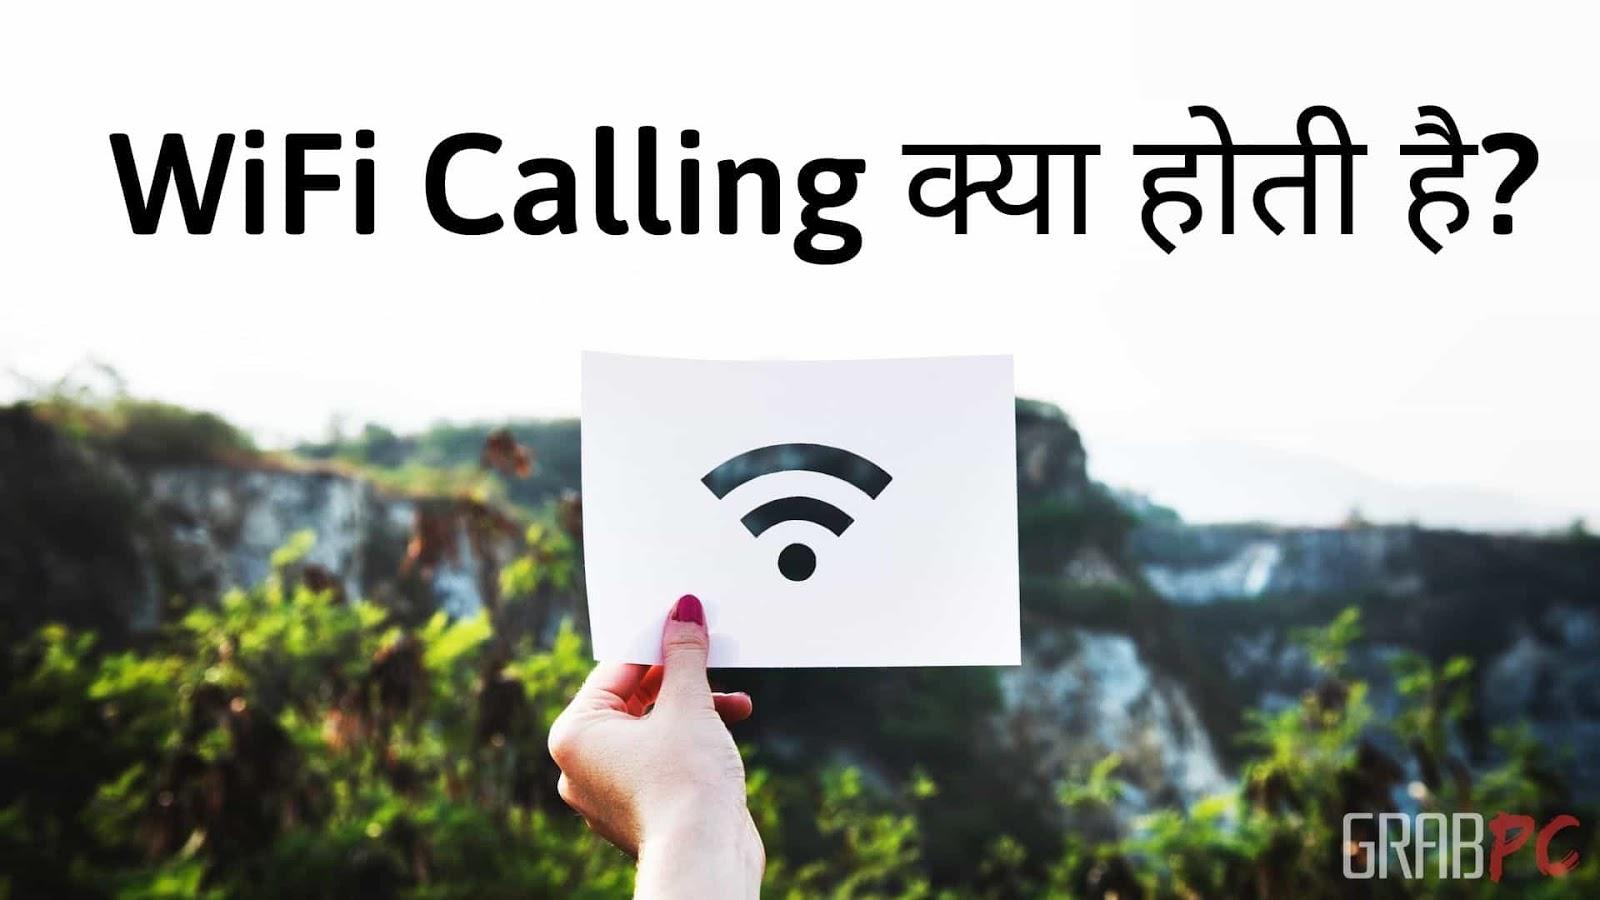 wifi-calling-kya-hoti-hai